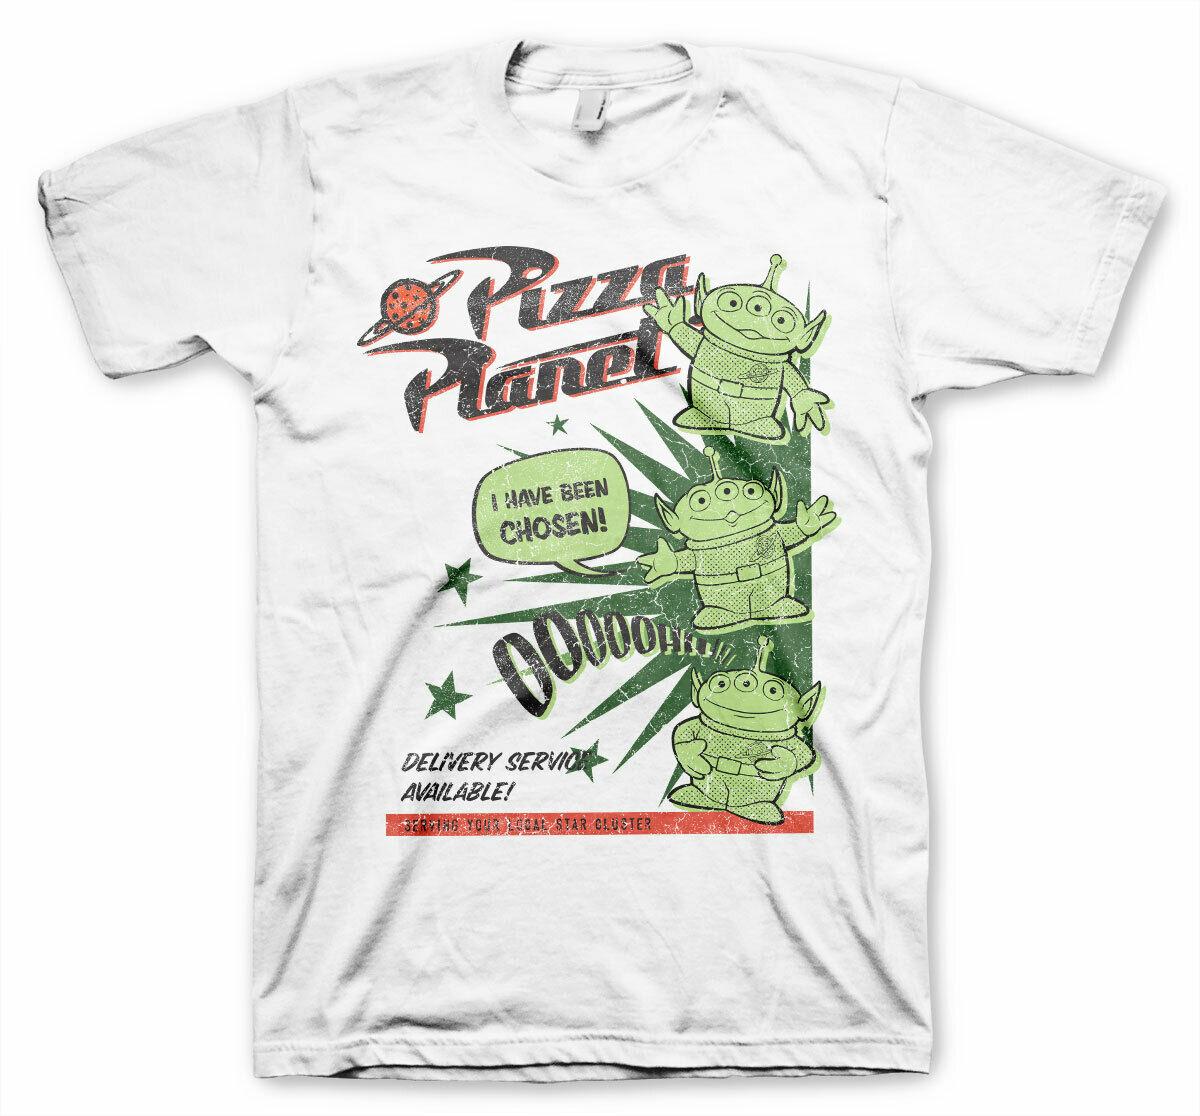 Camiseta oficial TOY STORY 4 PIZZA PLANET ALIENS I HAVE BEEN choosen blanco manga larga Hoddies unisex hoddie Camiseta de manga corta Shi